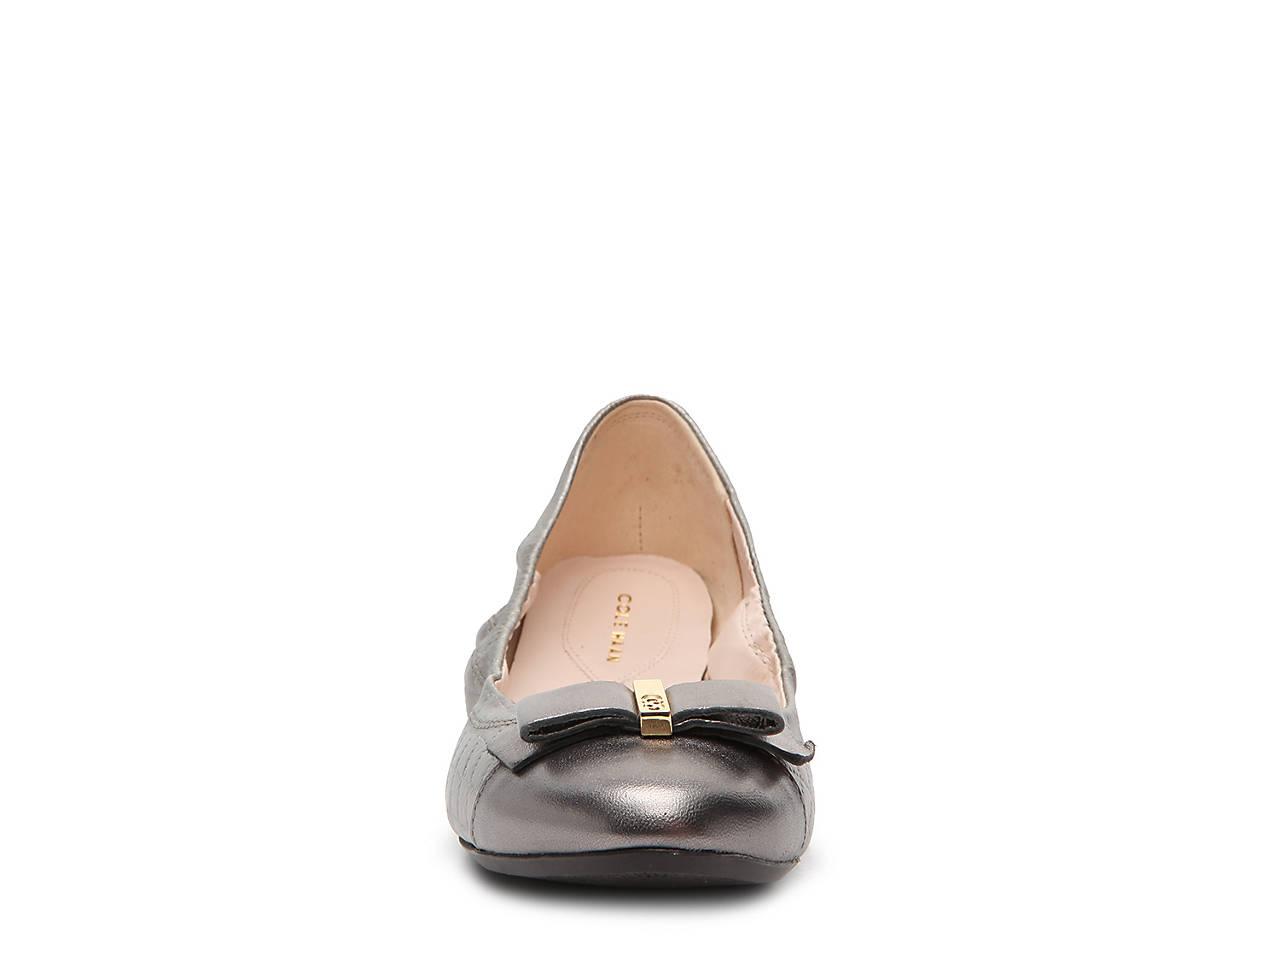 8a20d4f28 Home · Women's Shoes · Flats; Elsie Ballet Flat. previous